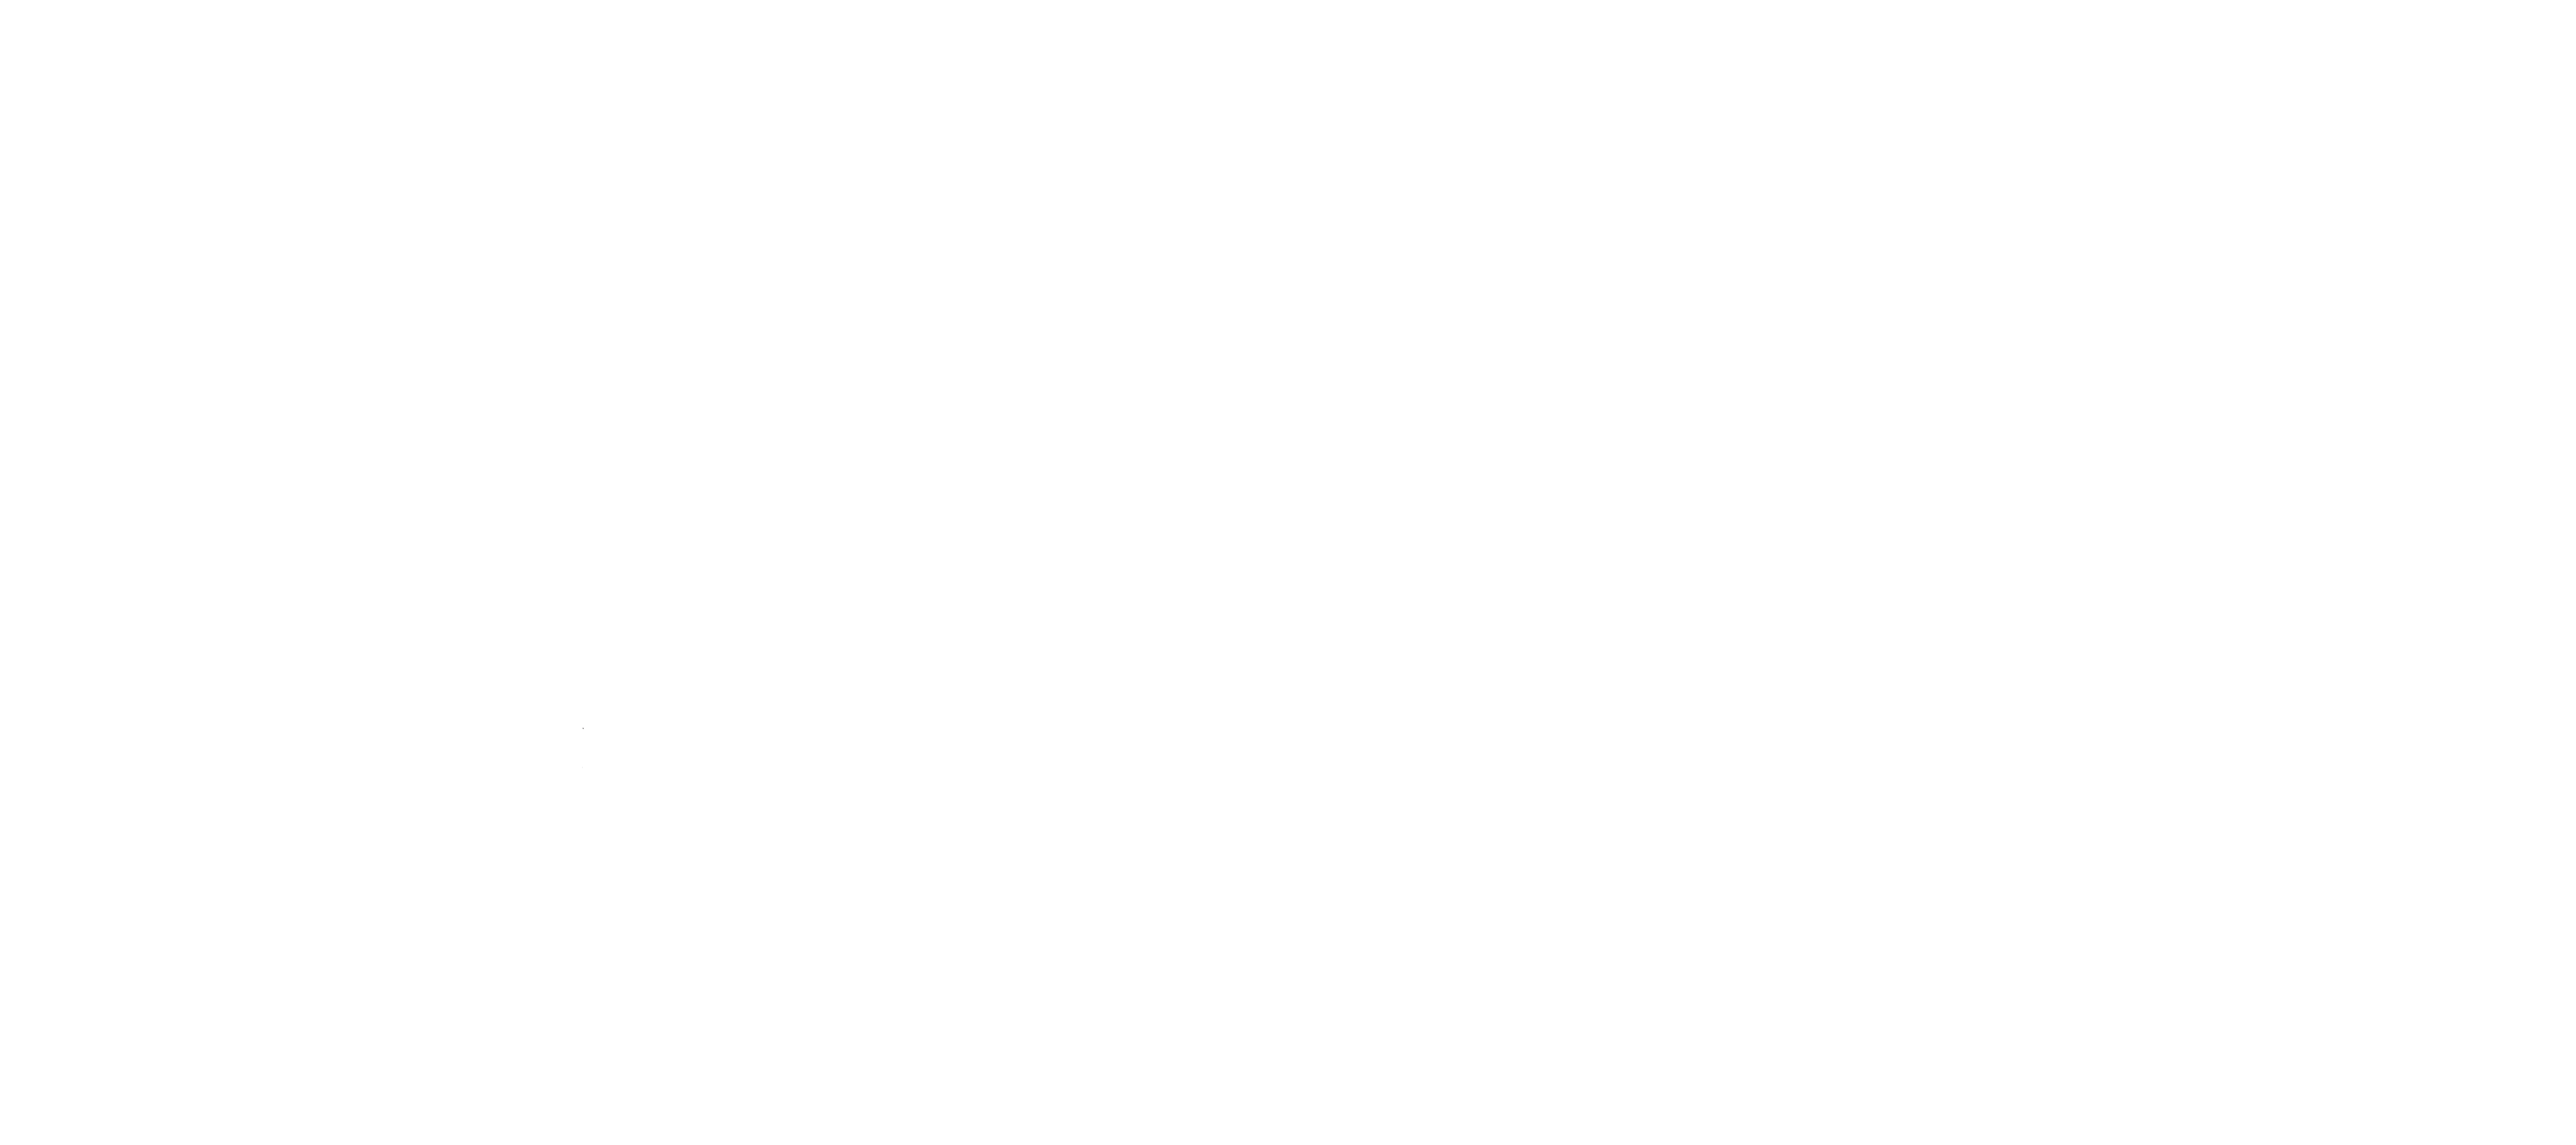 Emily Grace Photography